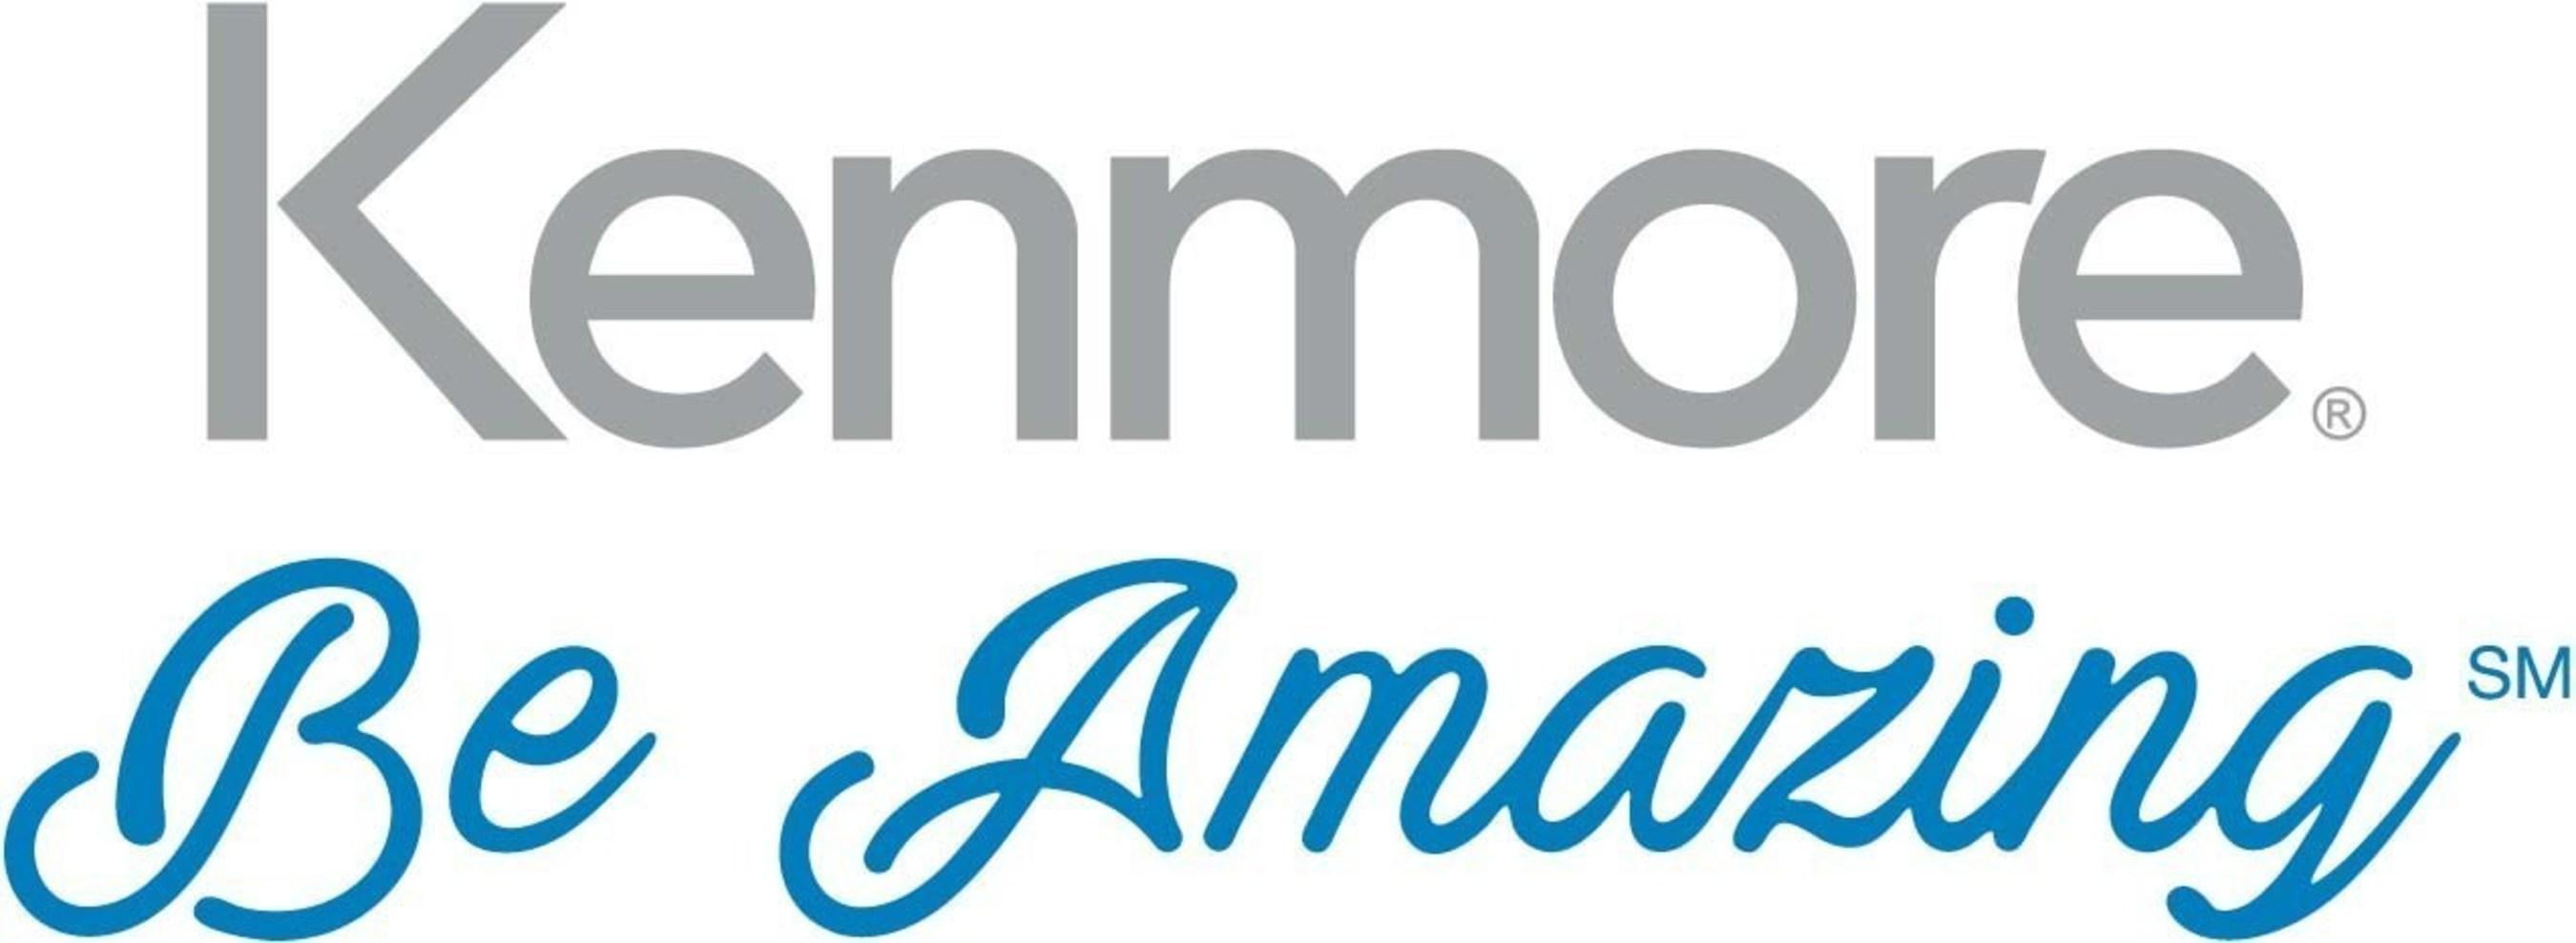 Kenmore_Be_Amazing_Lockup_Logo